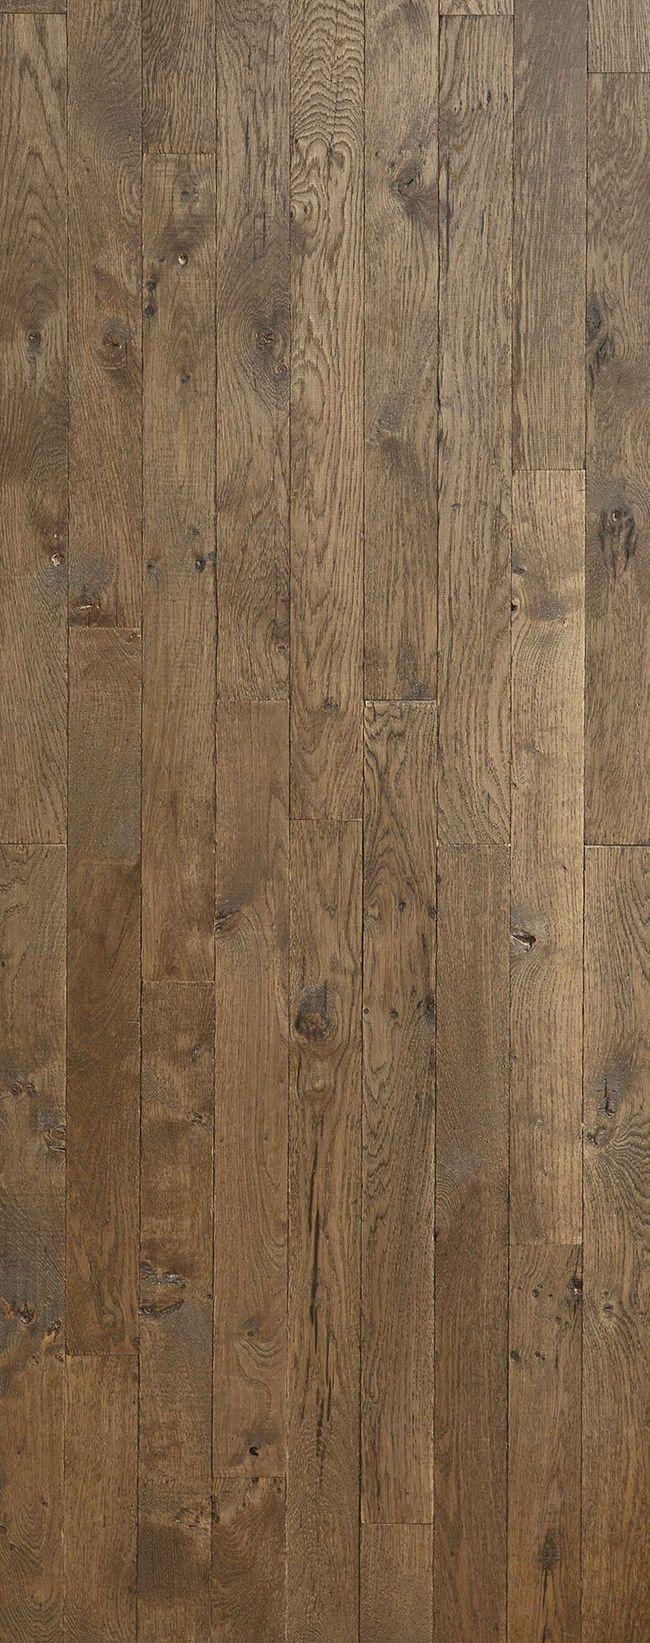 KAROL Rustic Distressed Oak